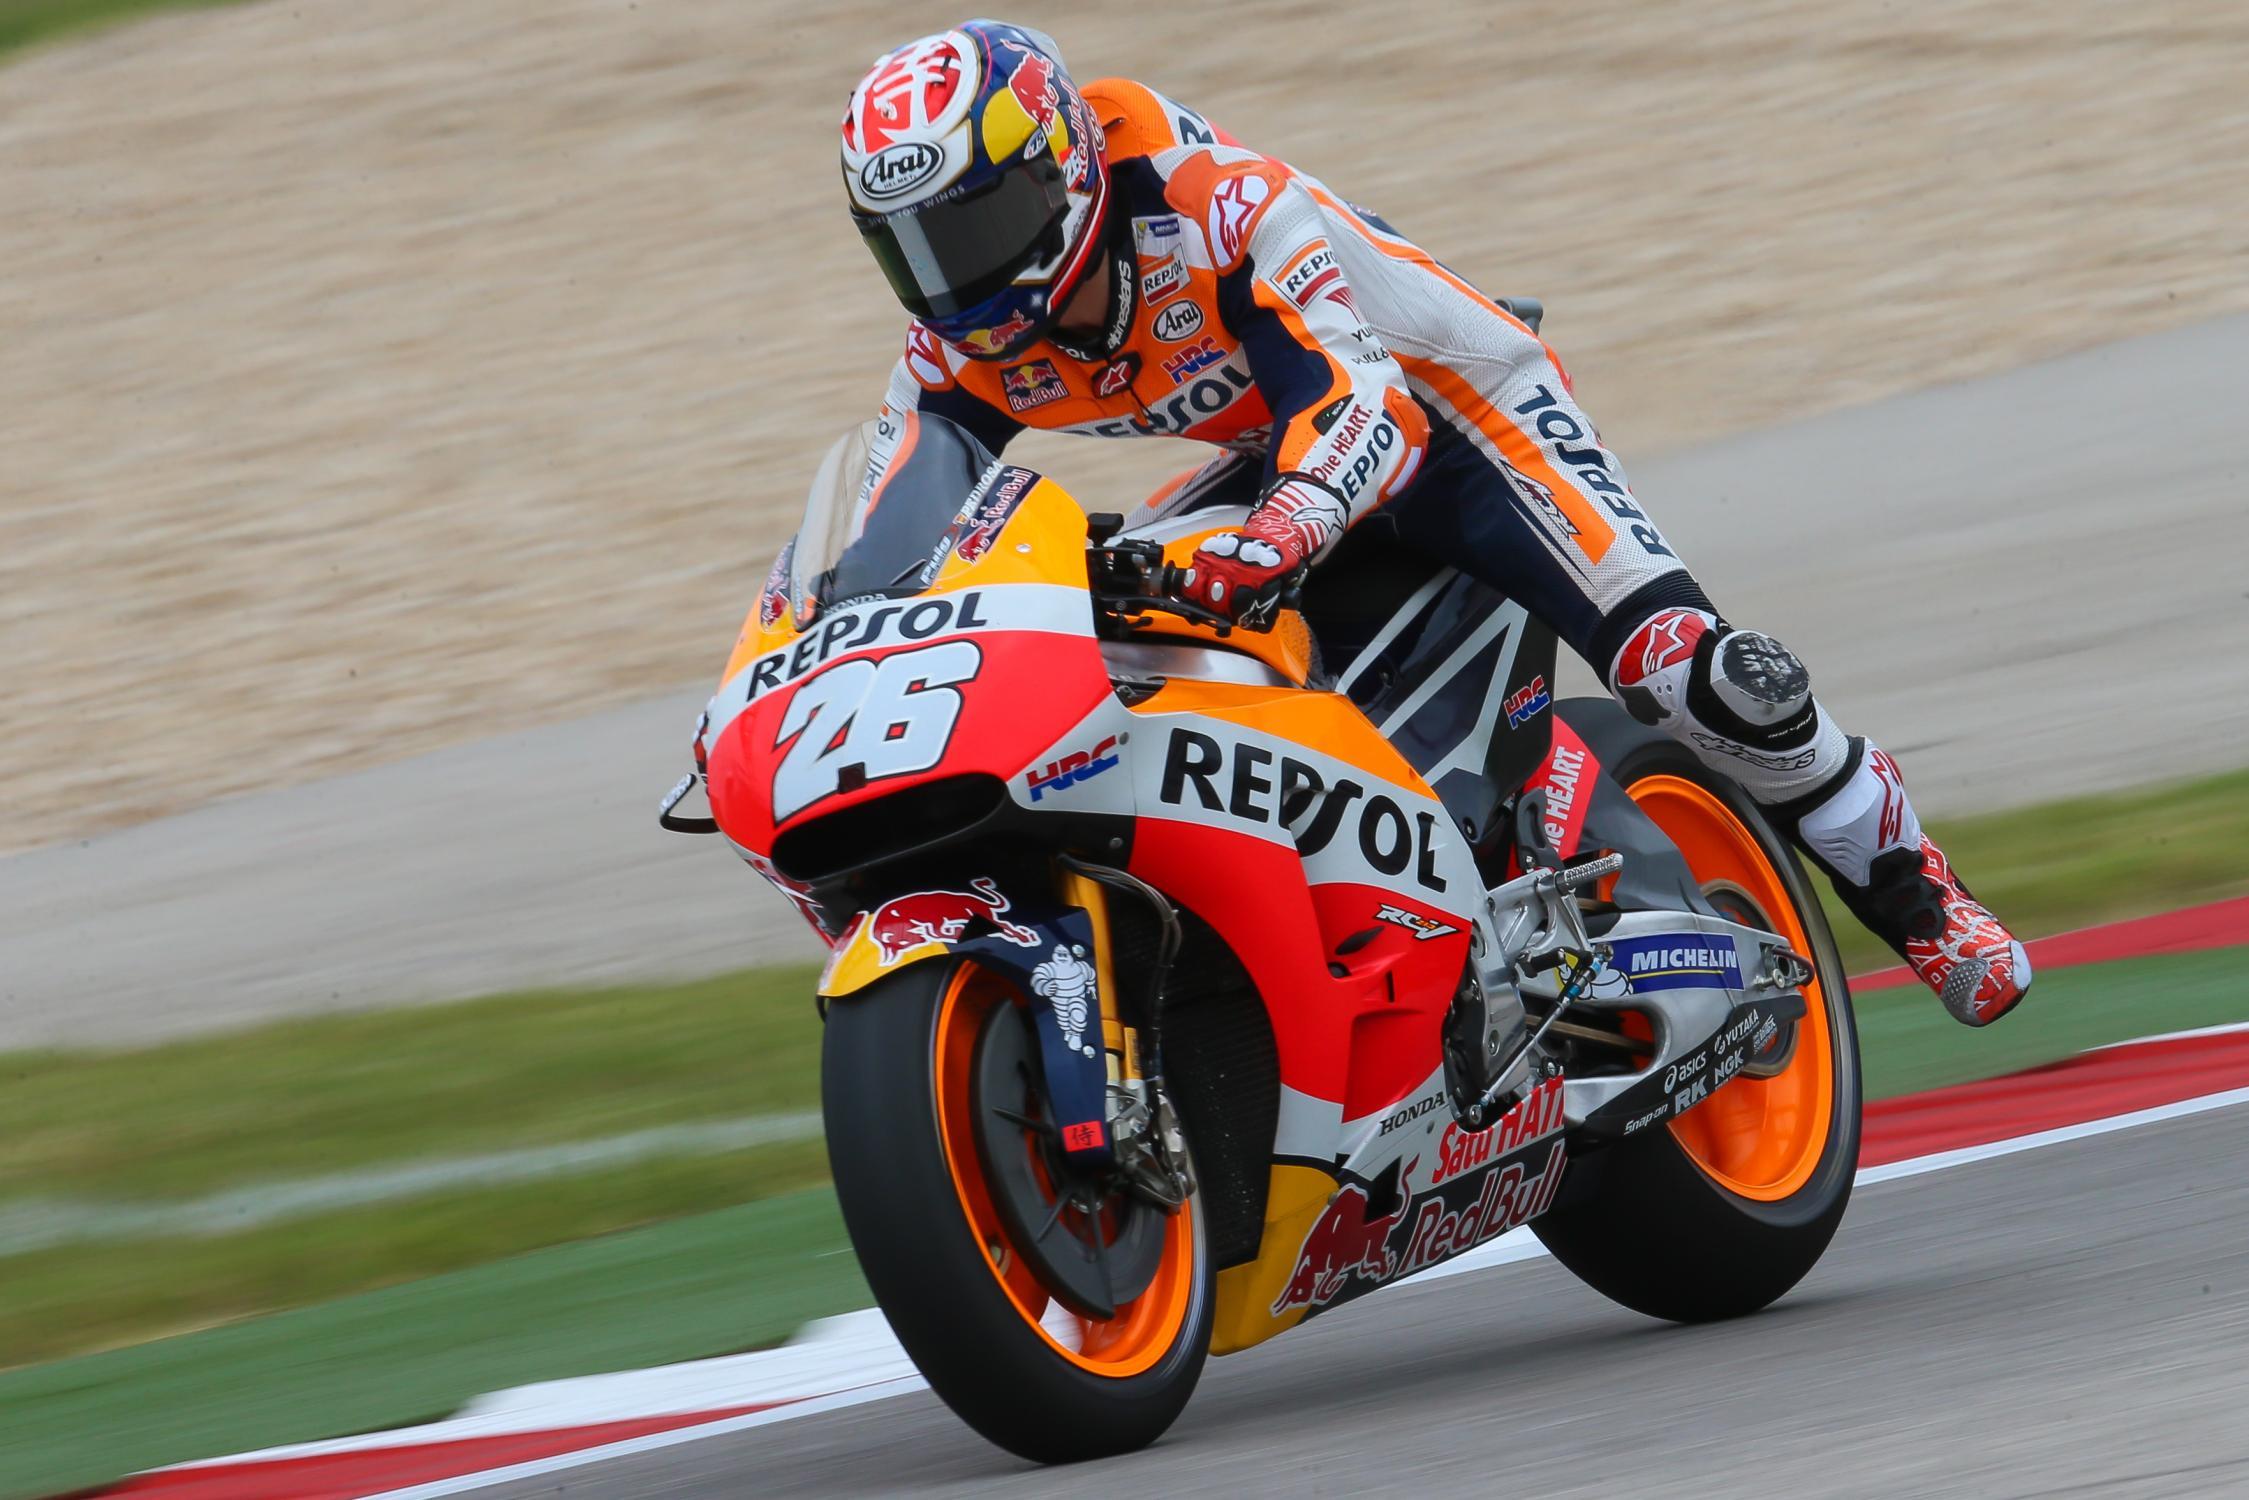 [MotoGP] Austin 26-dani-pedrosa-espbl1_9731.gallery_full_top_fullscreen